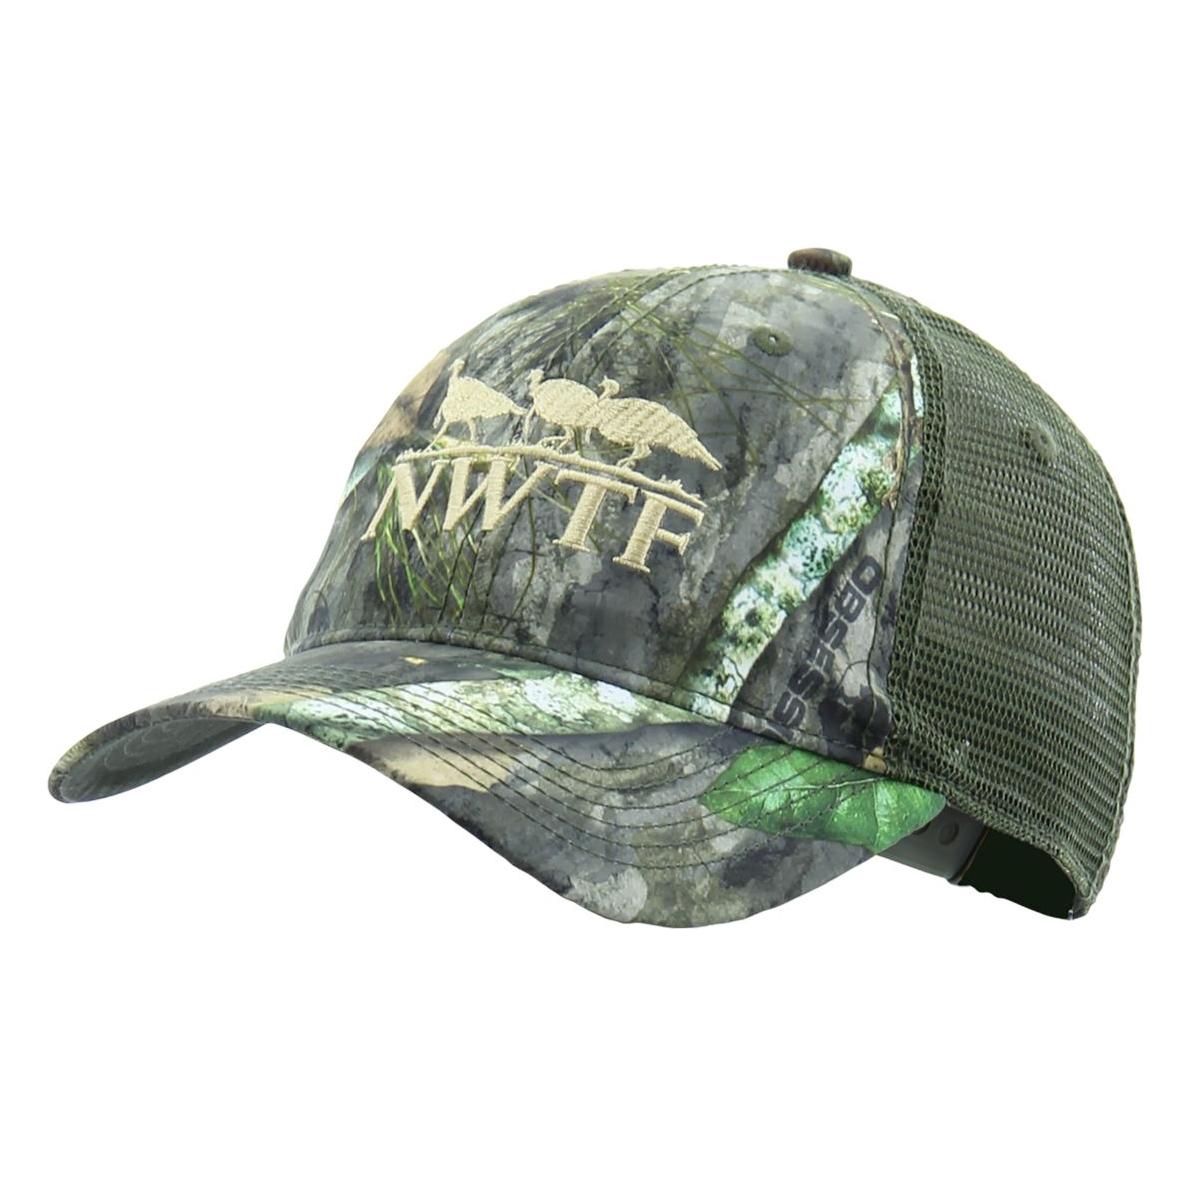 Nomad Men's NWTF Trucker Hat